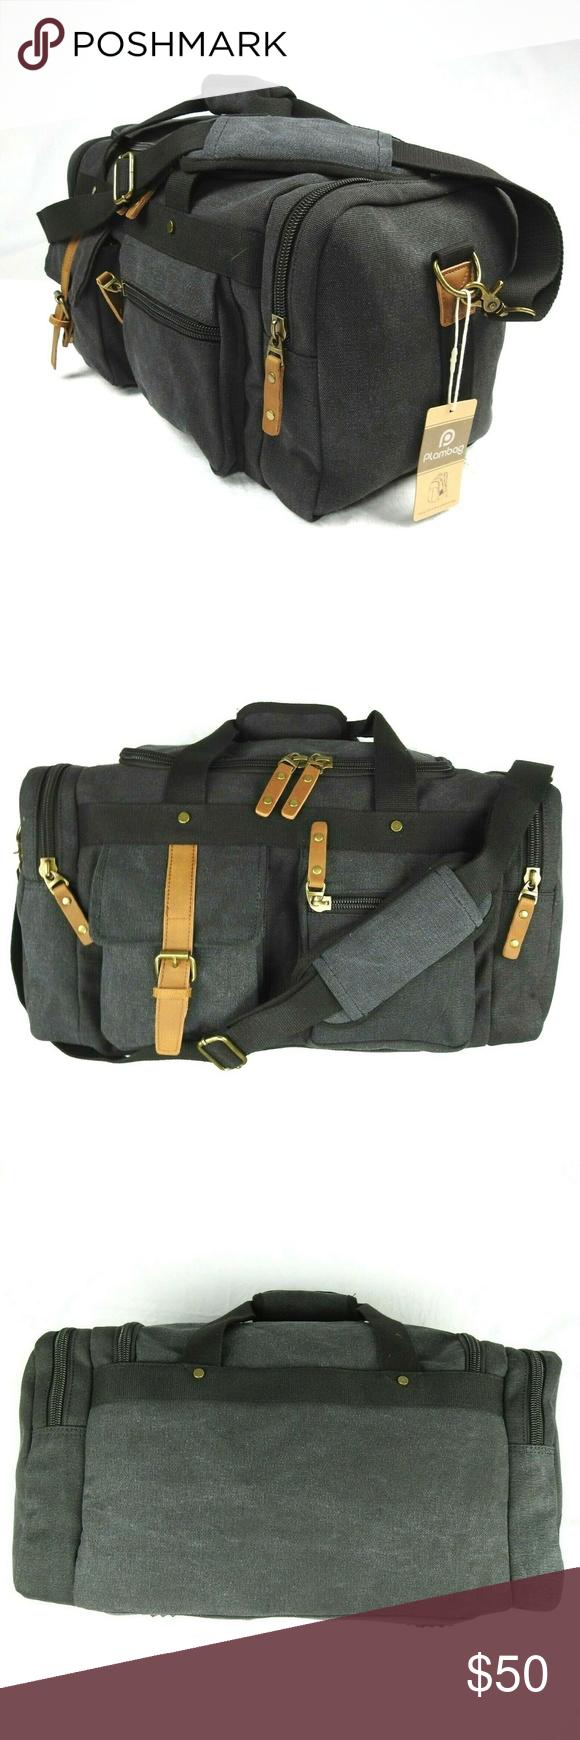 5edc8830184f Plambag Canvas Duffel Bag Overnight Travel Tote Plambag Canvas ...